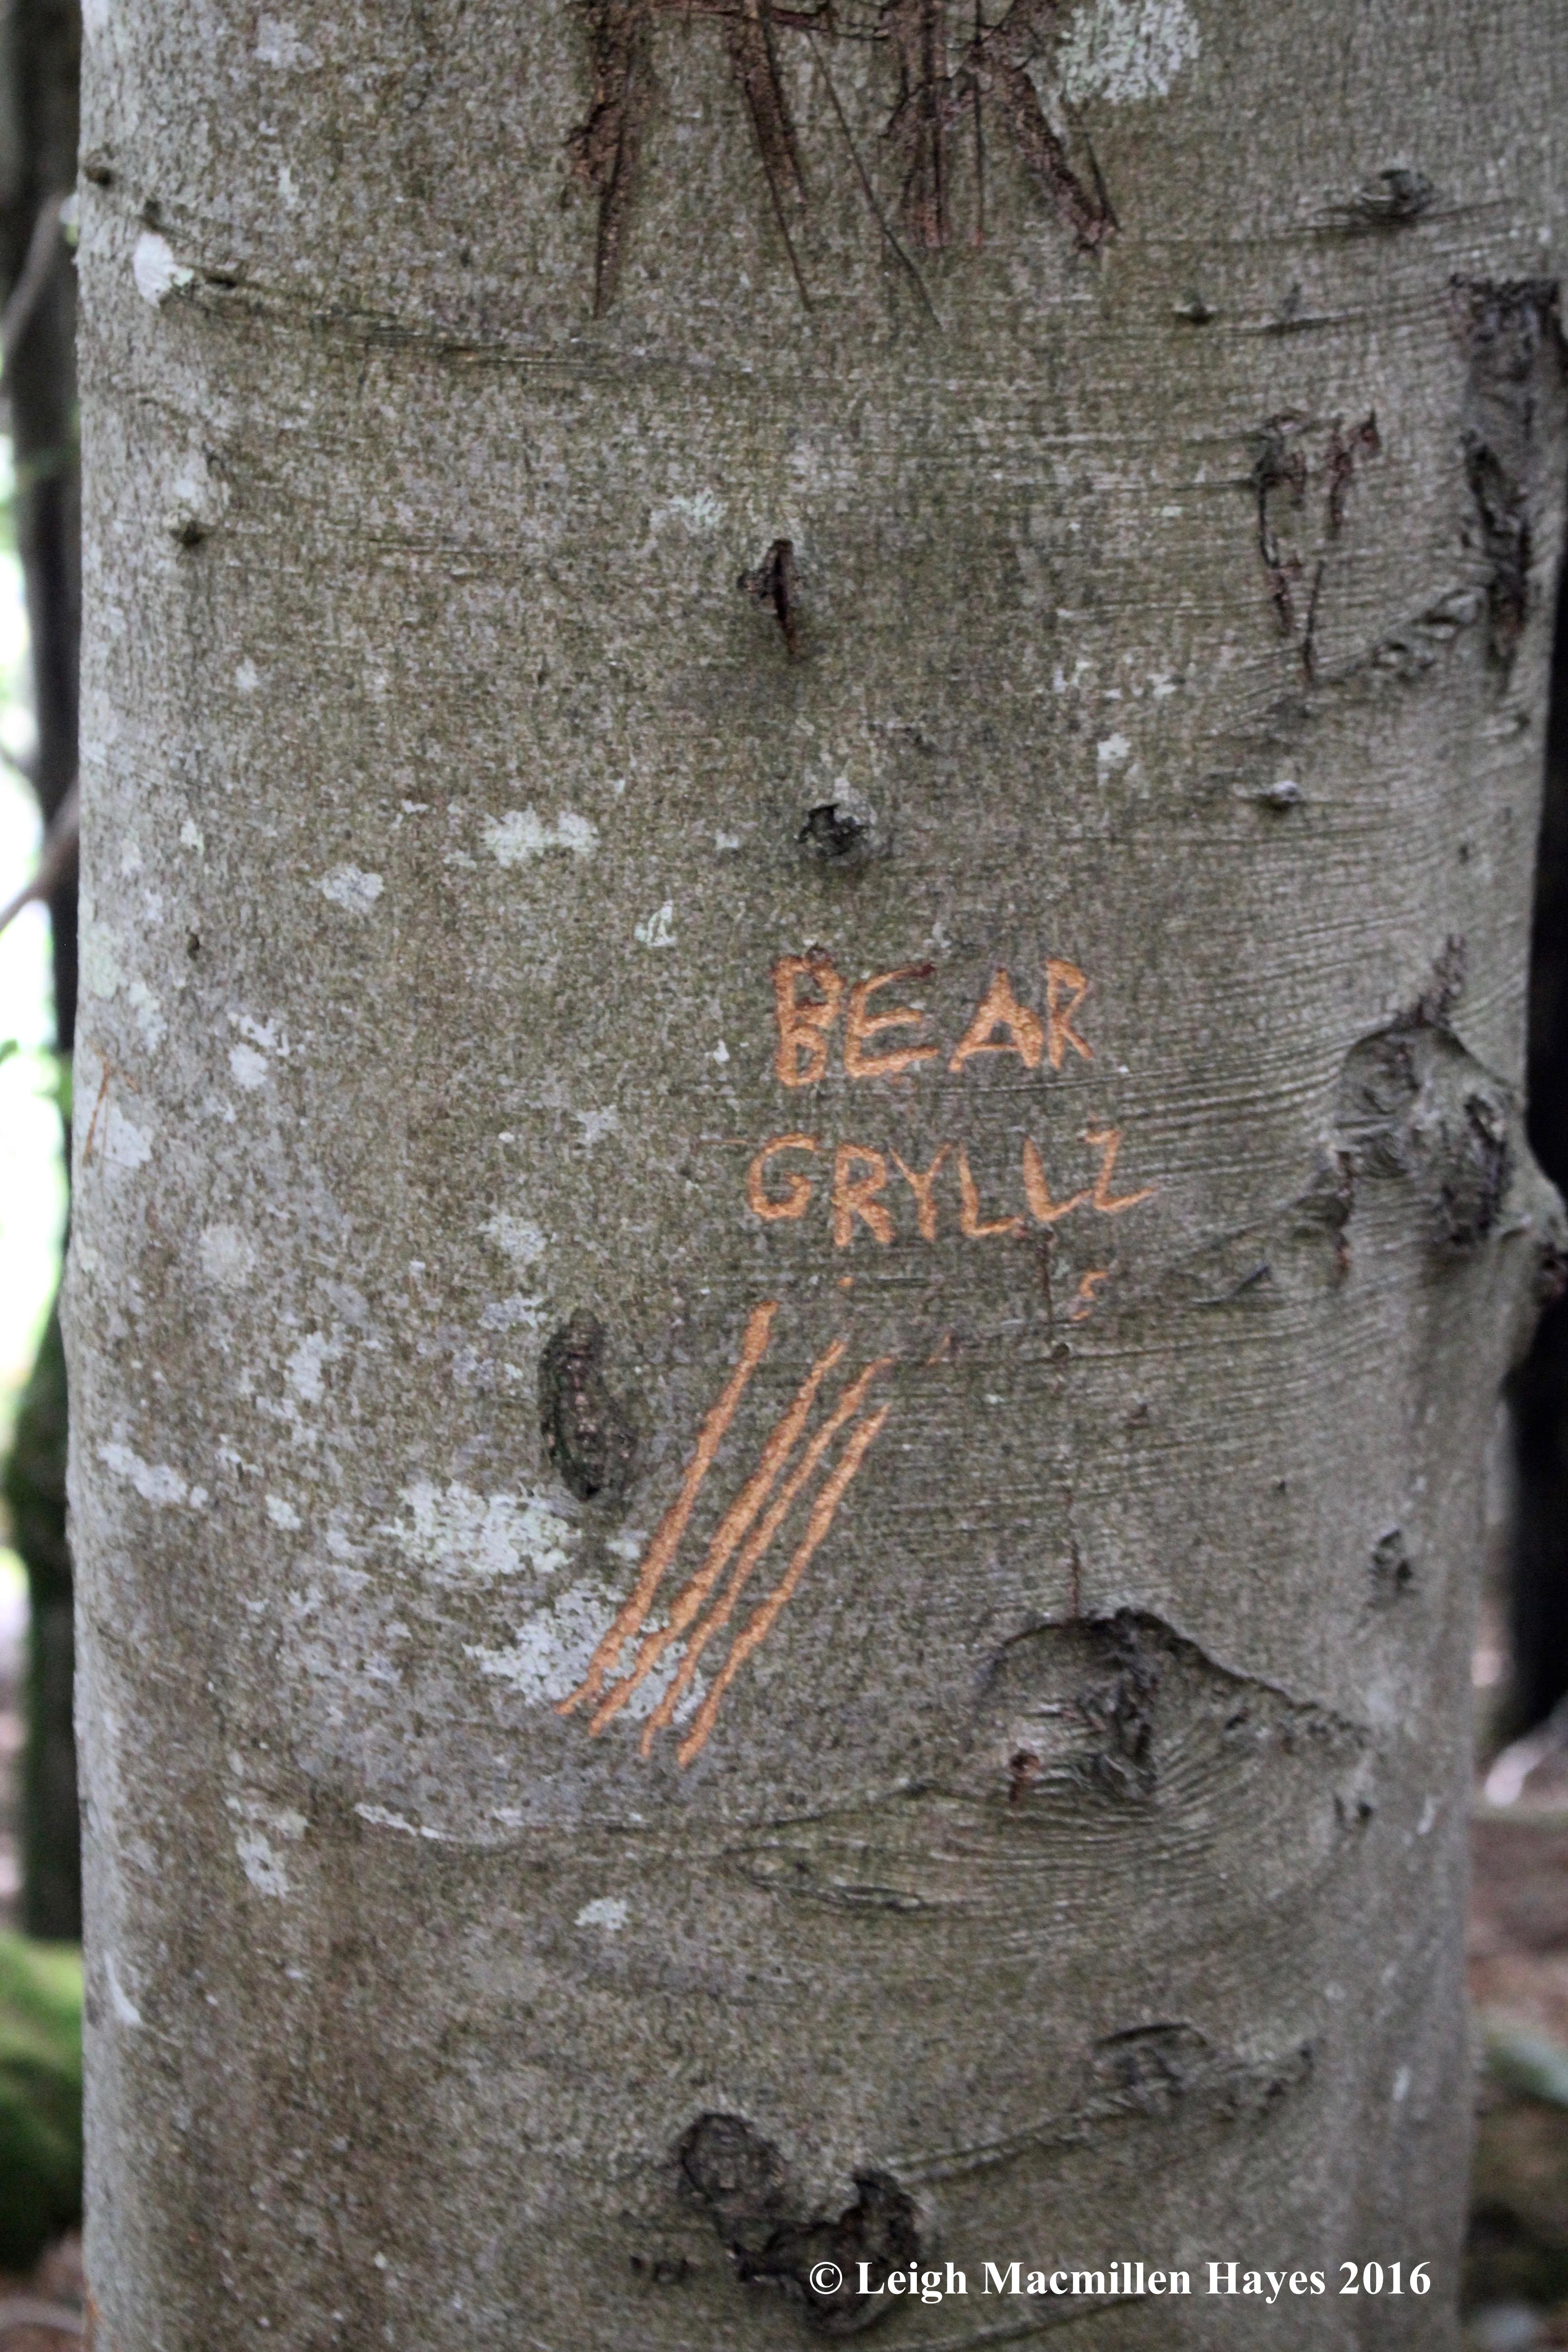 bear-gryllz-signature